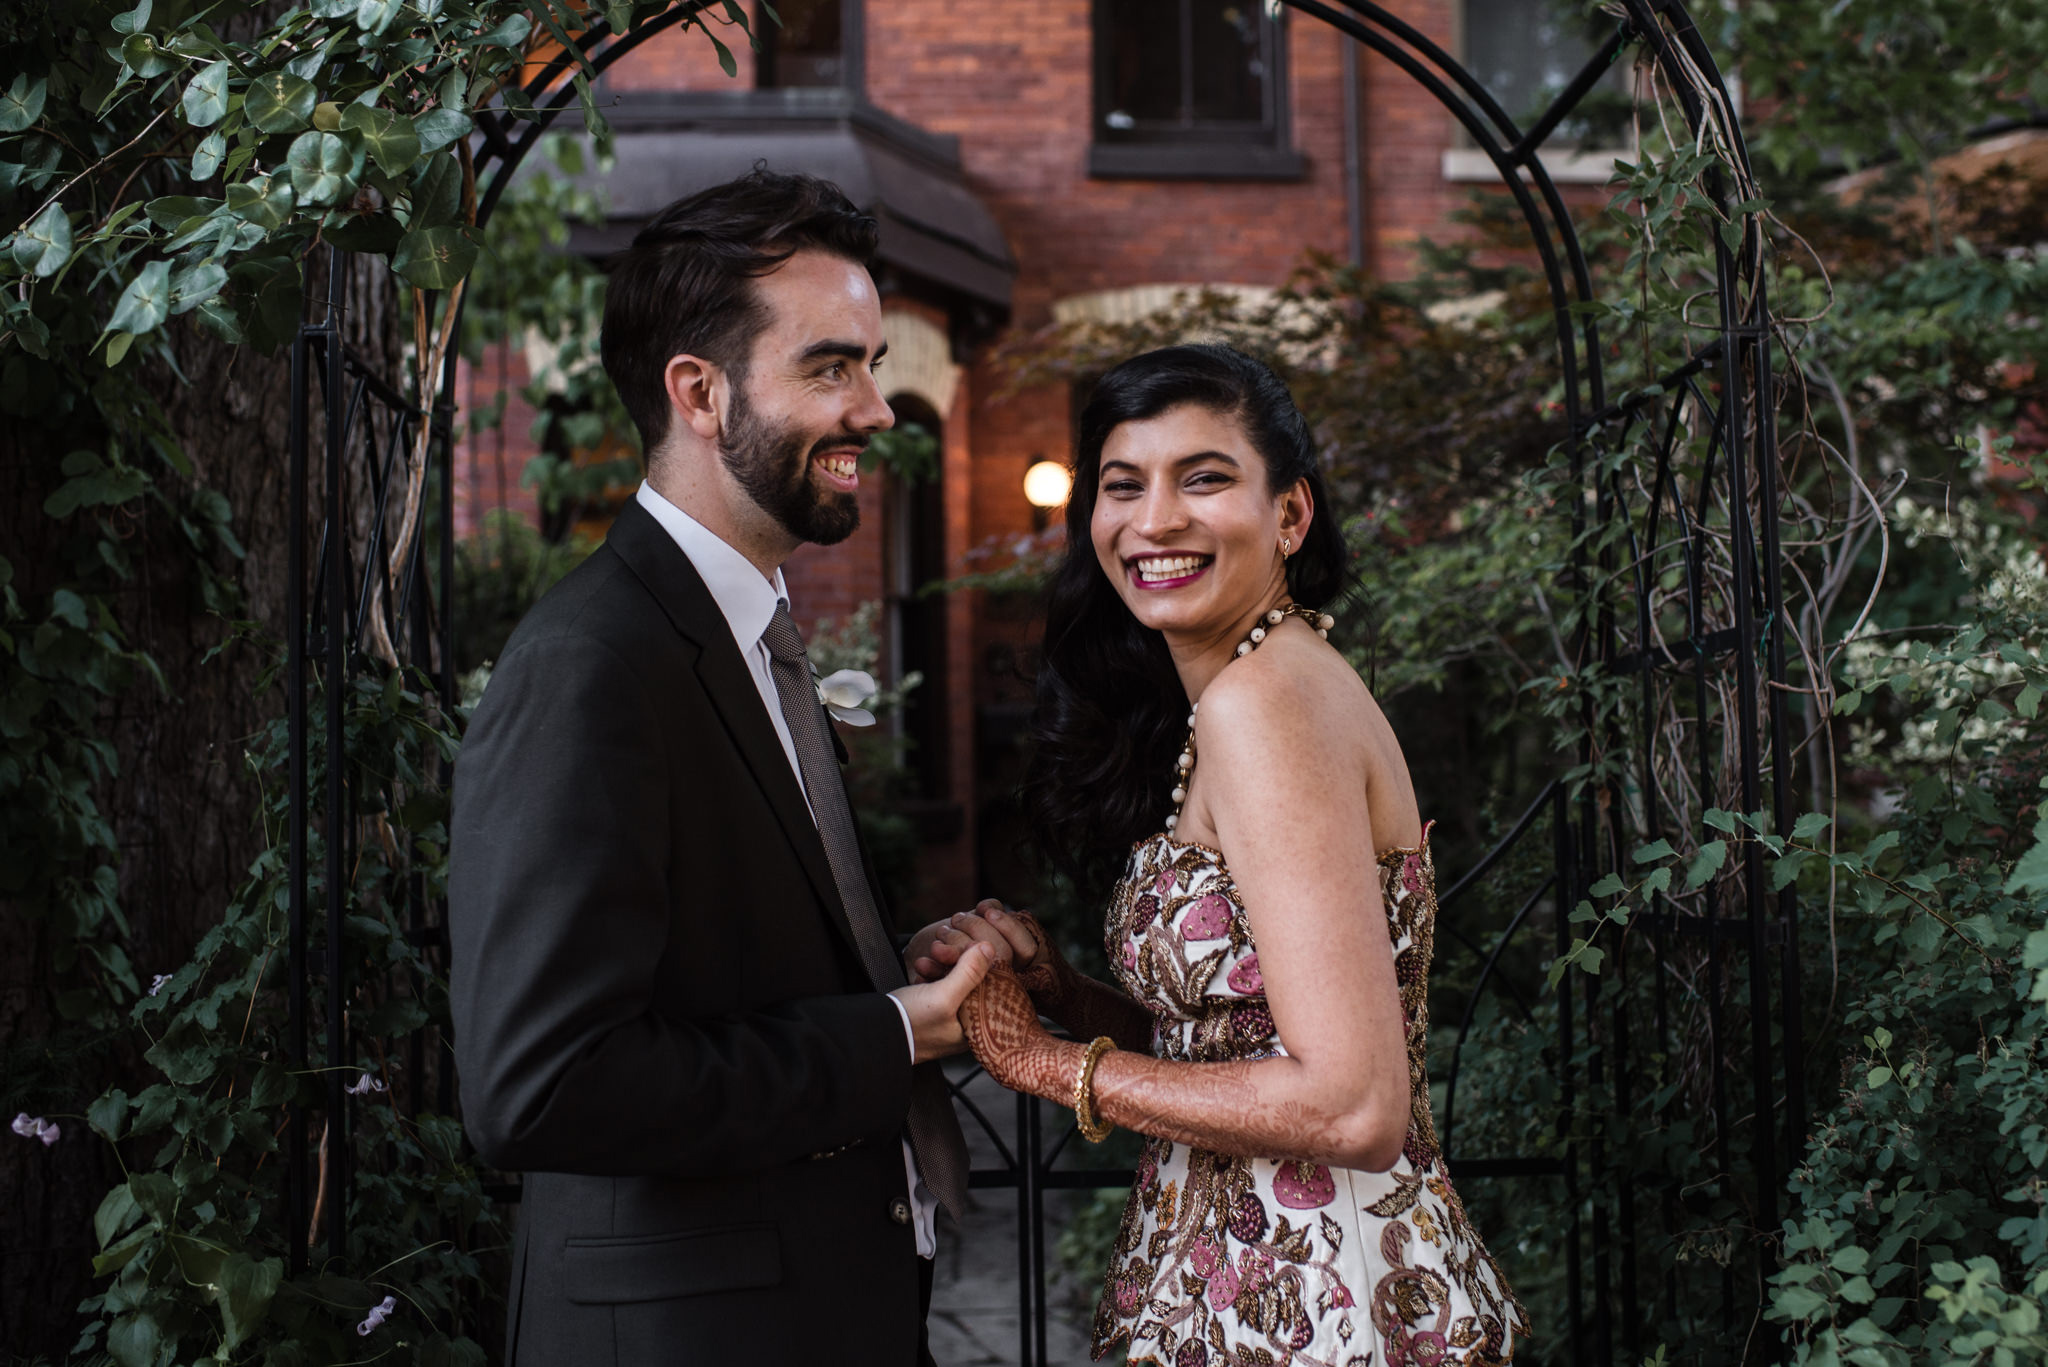 060-bride-groom-couple-wedding-photos-downtown-toronto-hotel-ocho.jpg